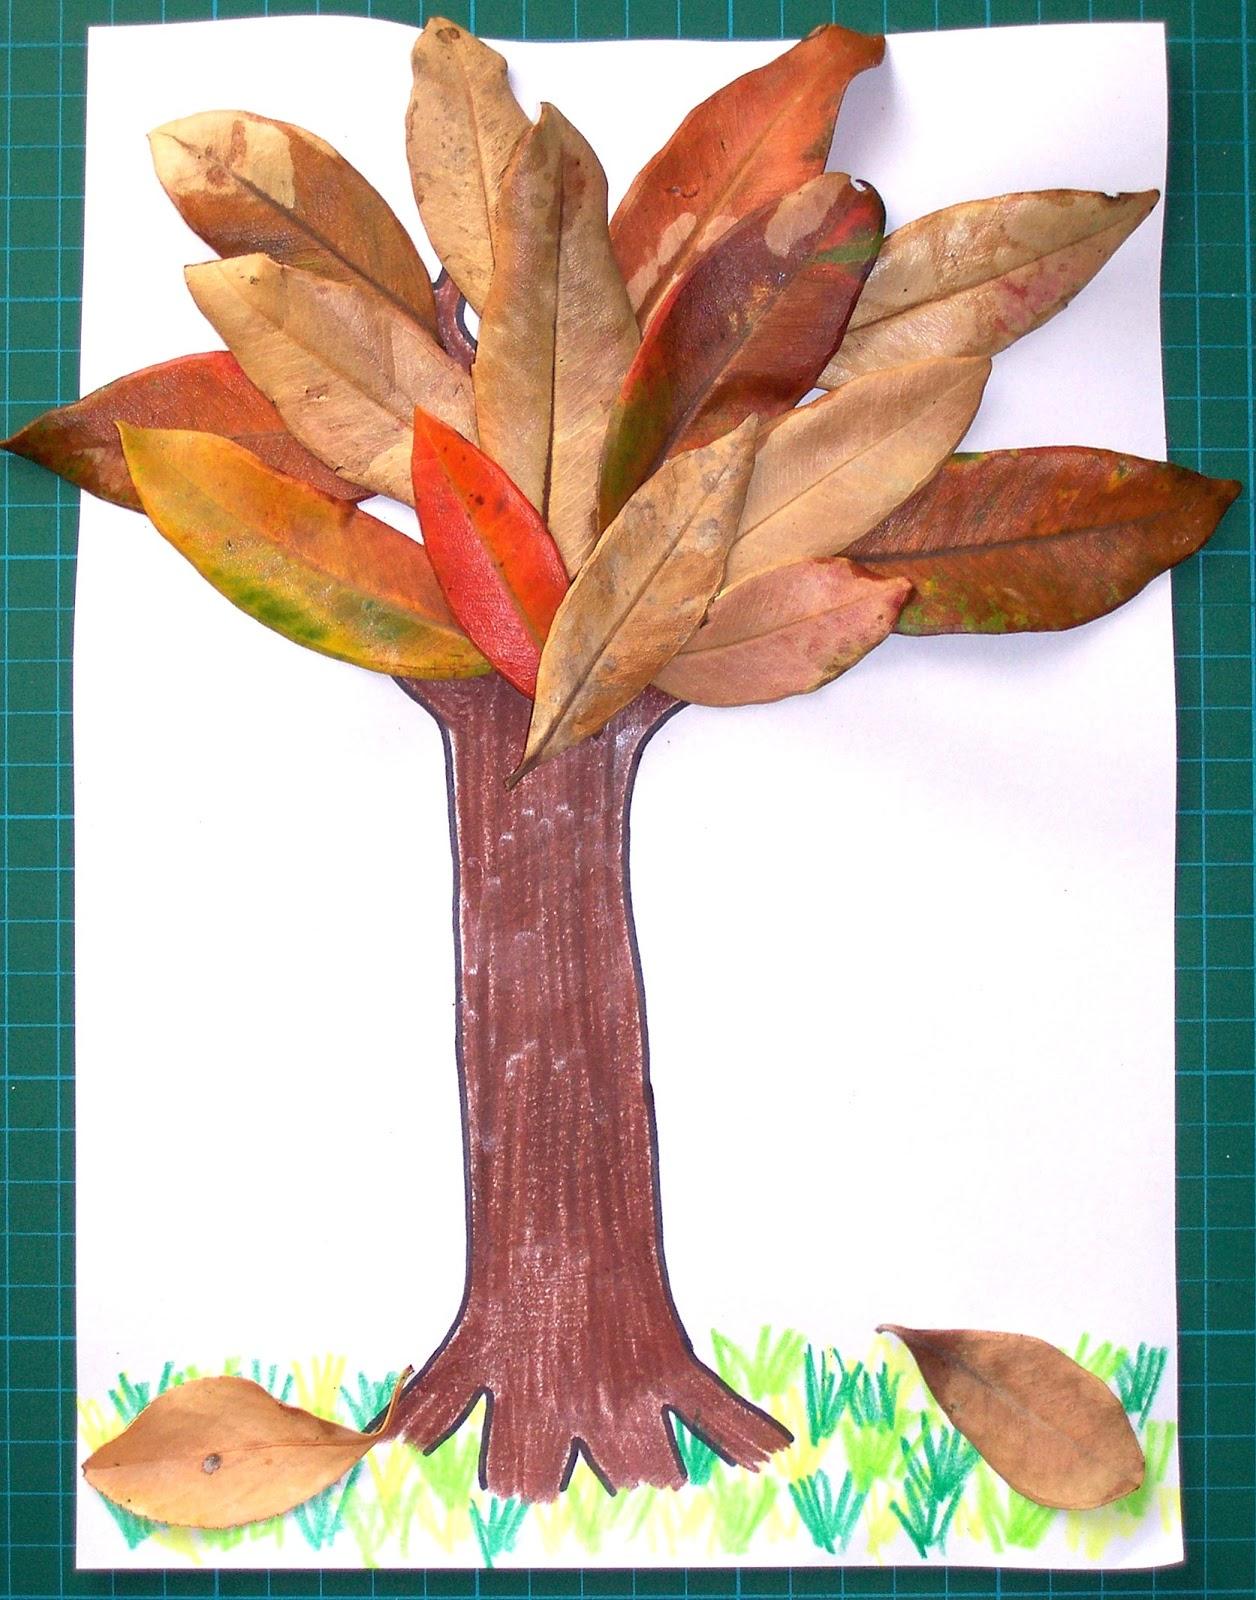 Autumn Craft Ideas Kids Part - 31: Autumn Kids Crafts1. Autumn Kids Crafts